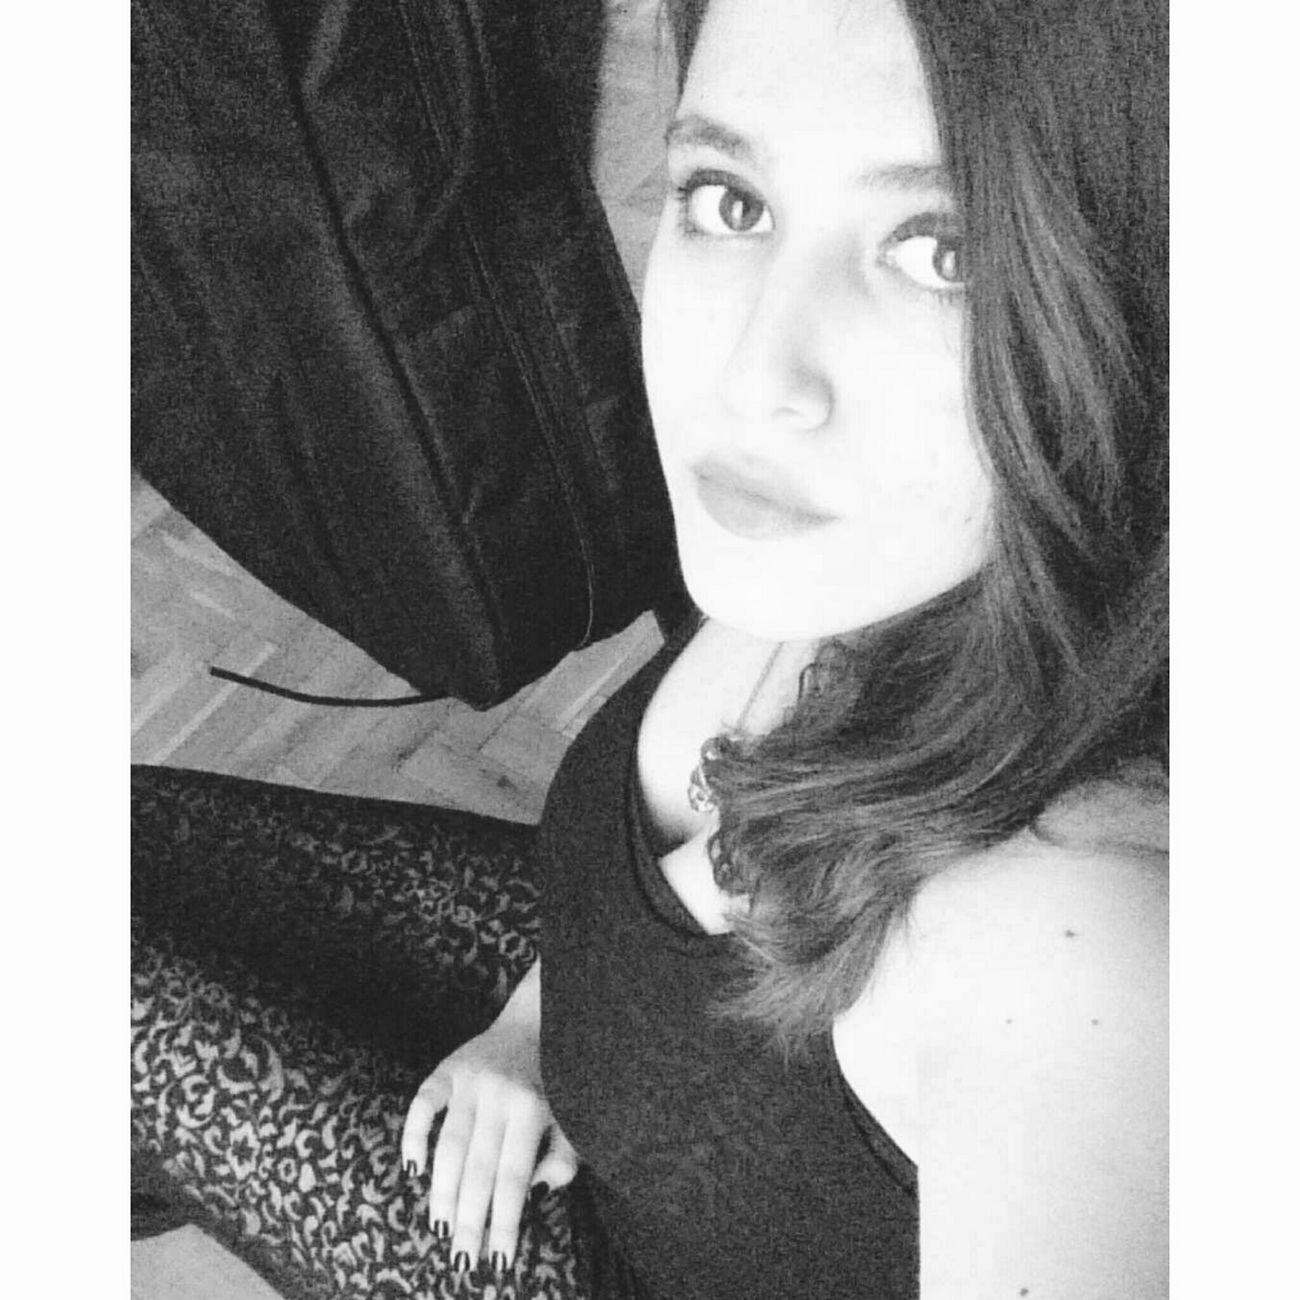 instagram: beyda.x